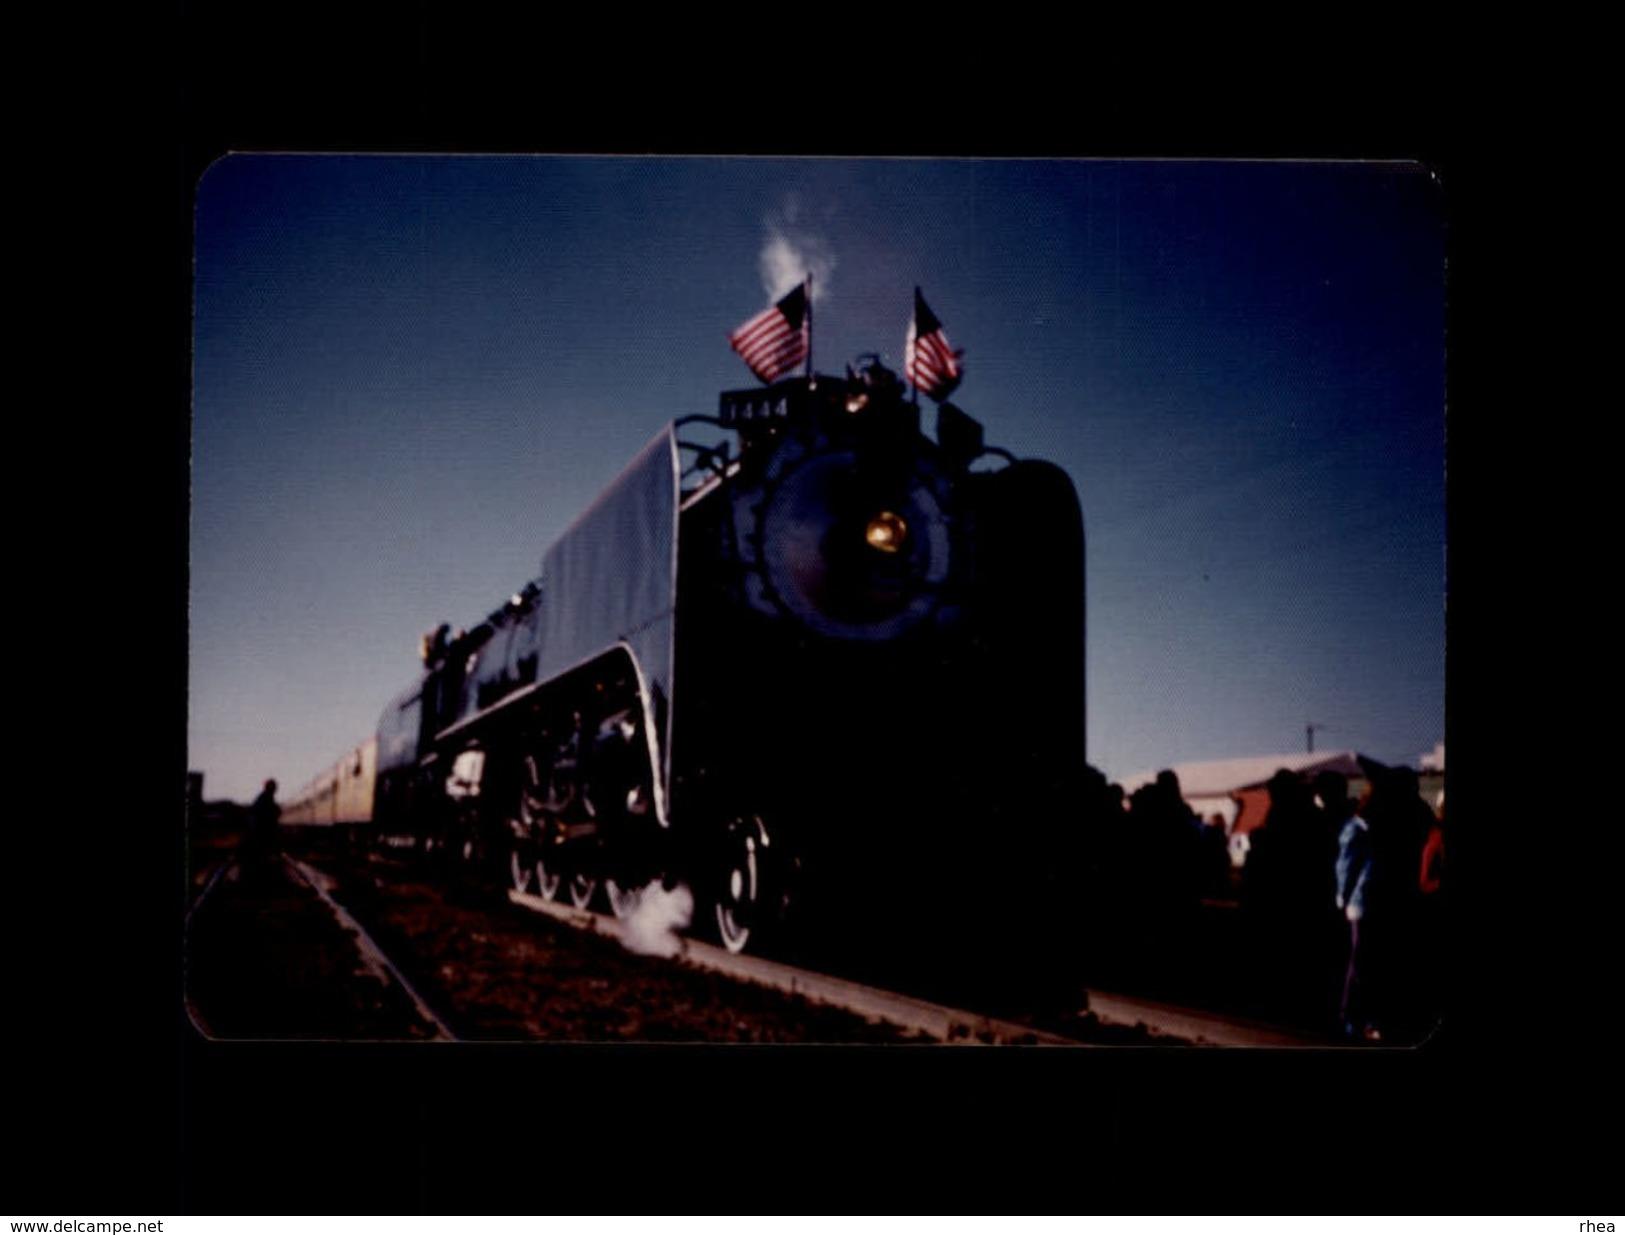 TRAINS - USA - Locomotive - Train - Trains